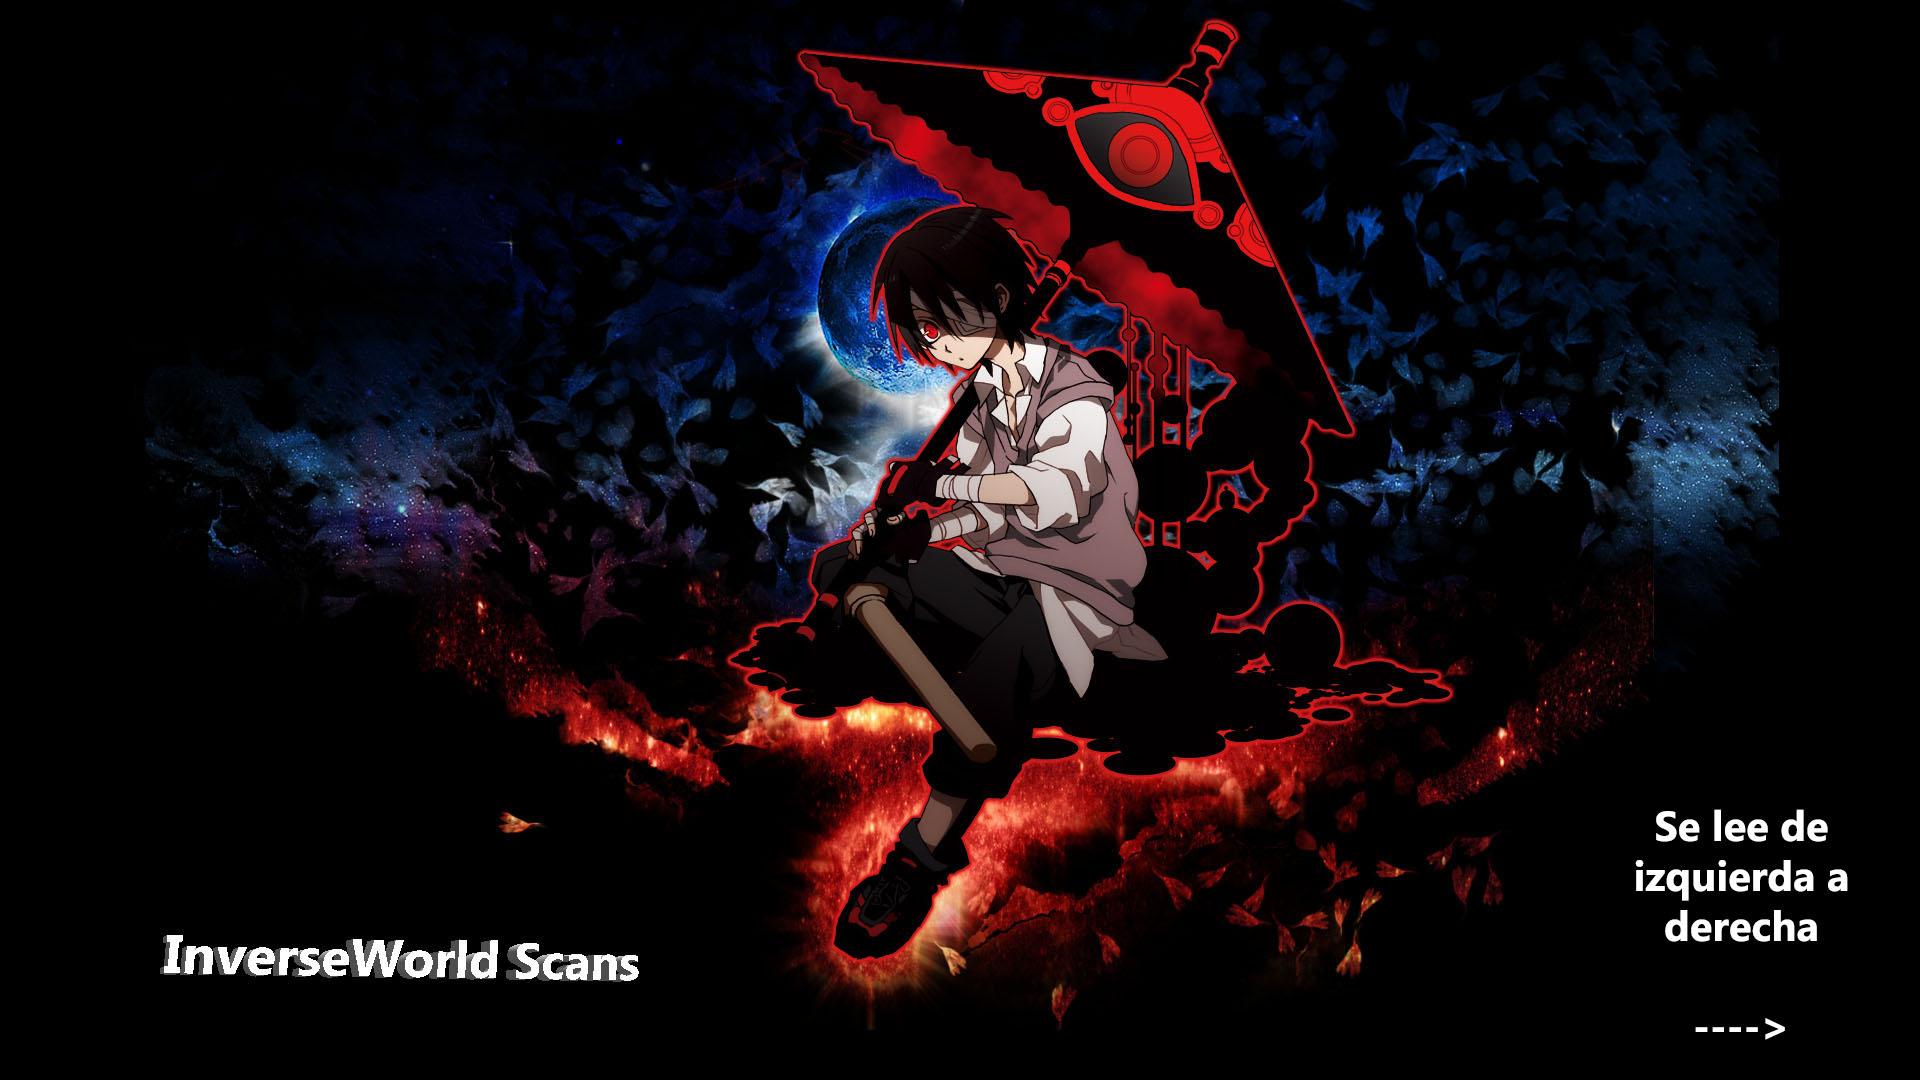 http://c5.ninemanga.com/es_manga/18/16210/415299/2125f84e79cff29c41d0b0afcc65d243.jpg Page 2